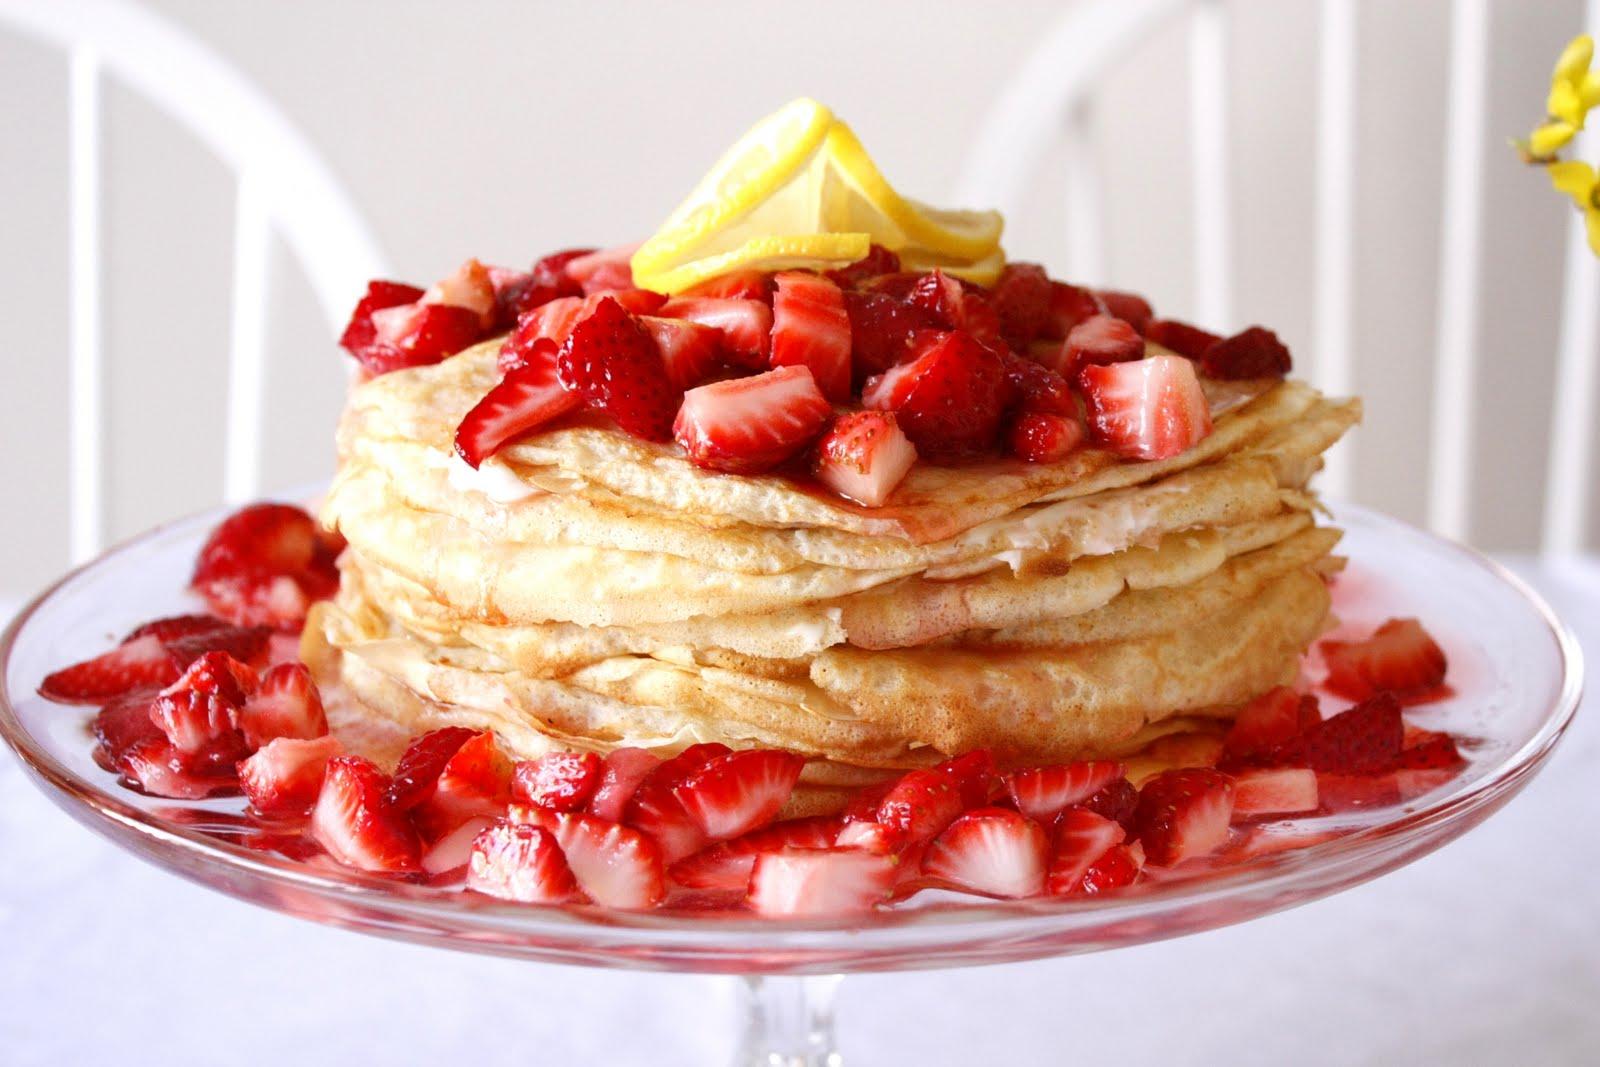 Korean Crepe Cake Recipe: Mamas' Seoul Food: Lemon Strawberry Crepe Cake